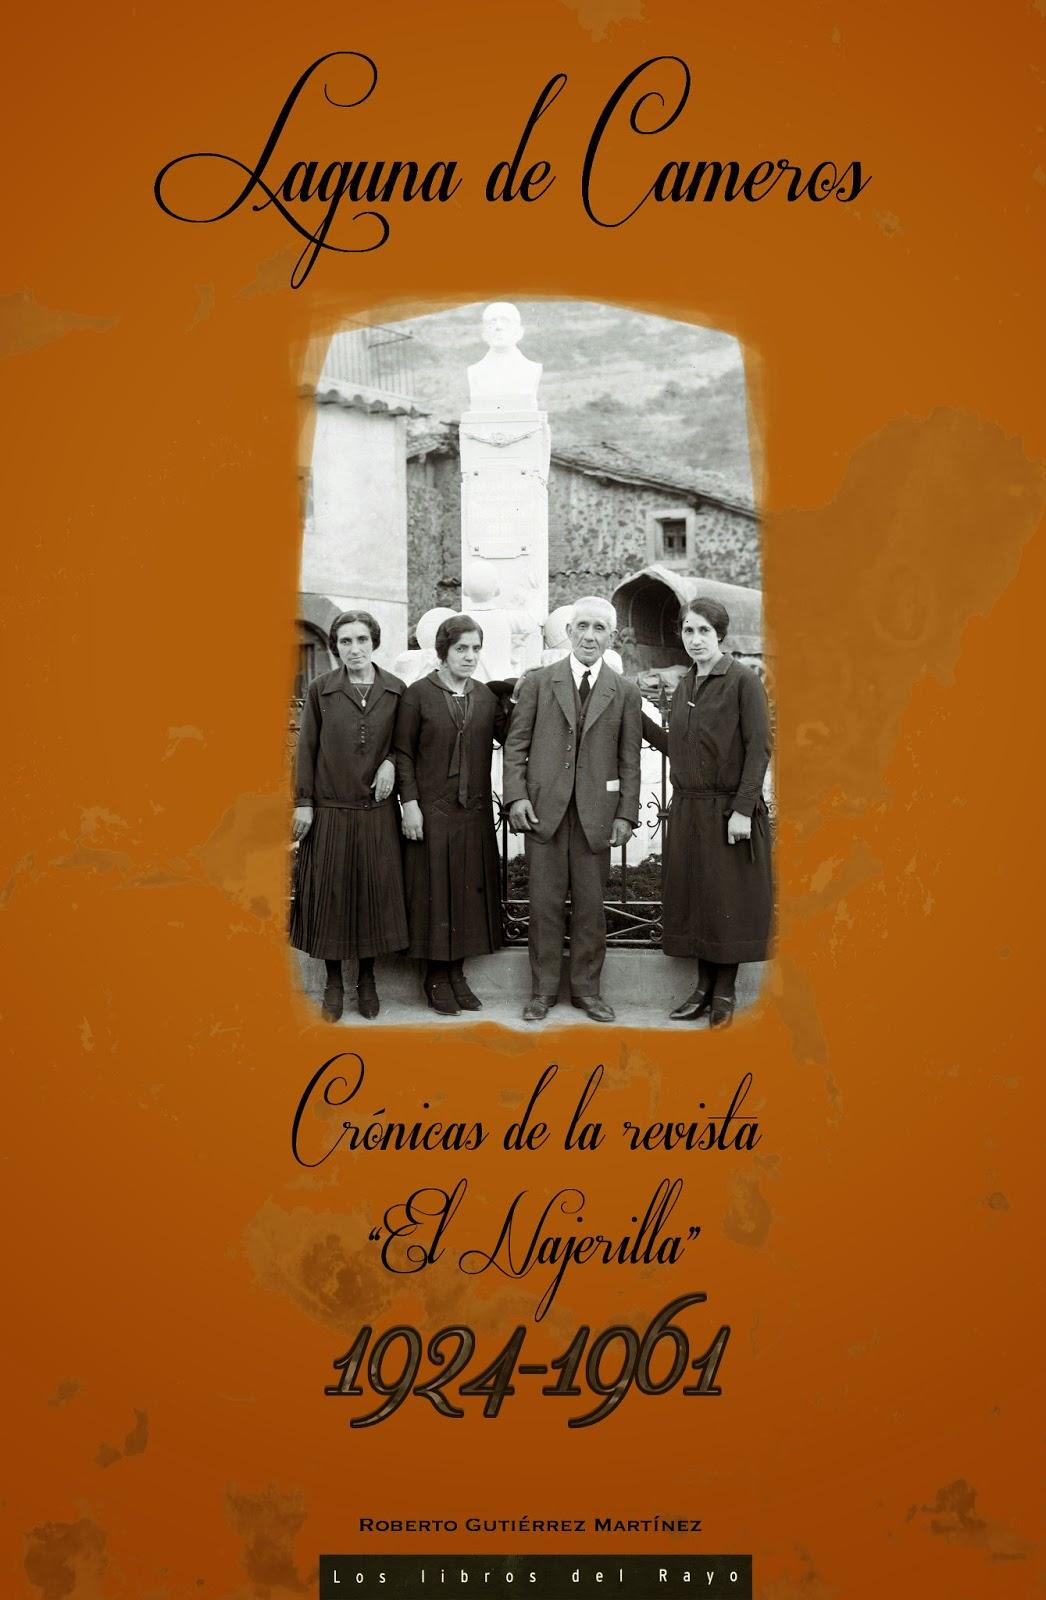 Gutiérrez Martínez, Roberto, Laguna de Cameros.